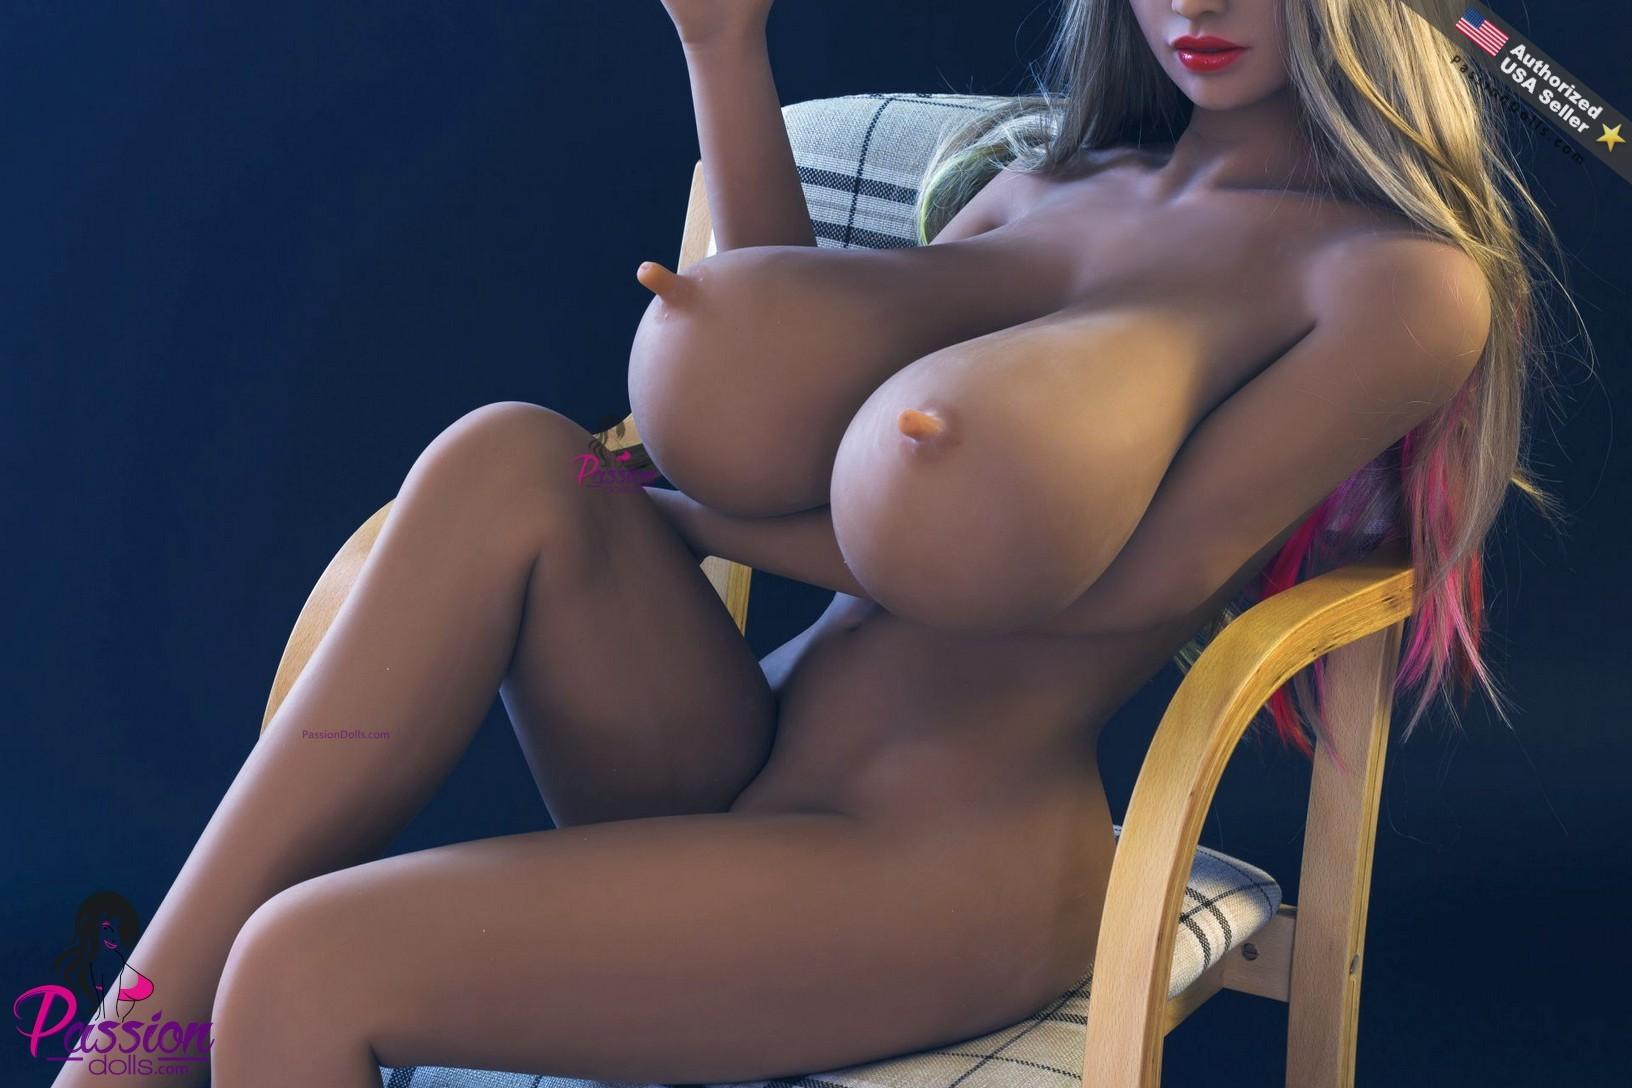 Sex barbie doll images 182